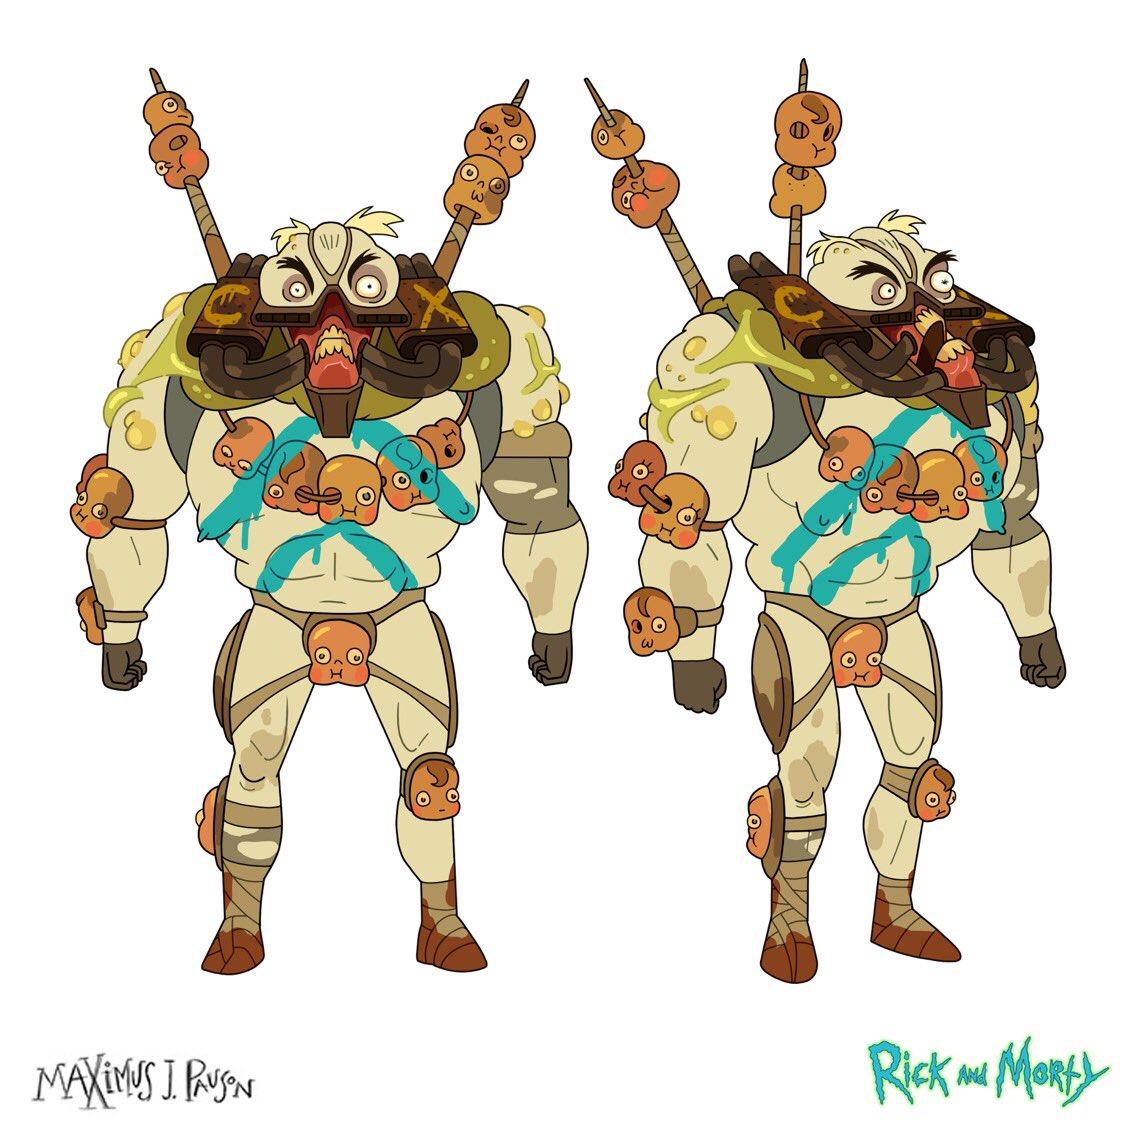 Maximus J Pauson On Twitter Character Design Of Colossus I